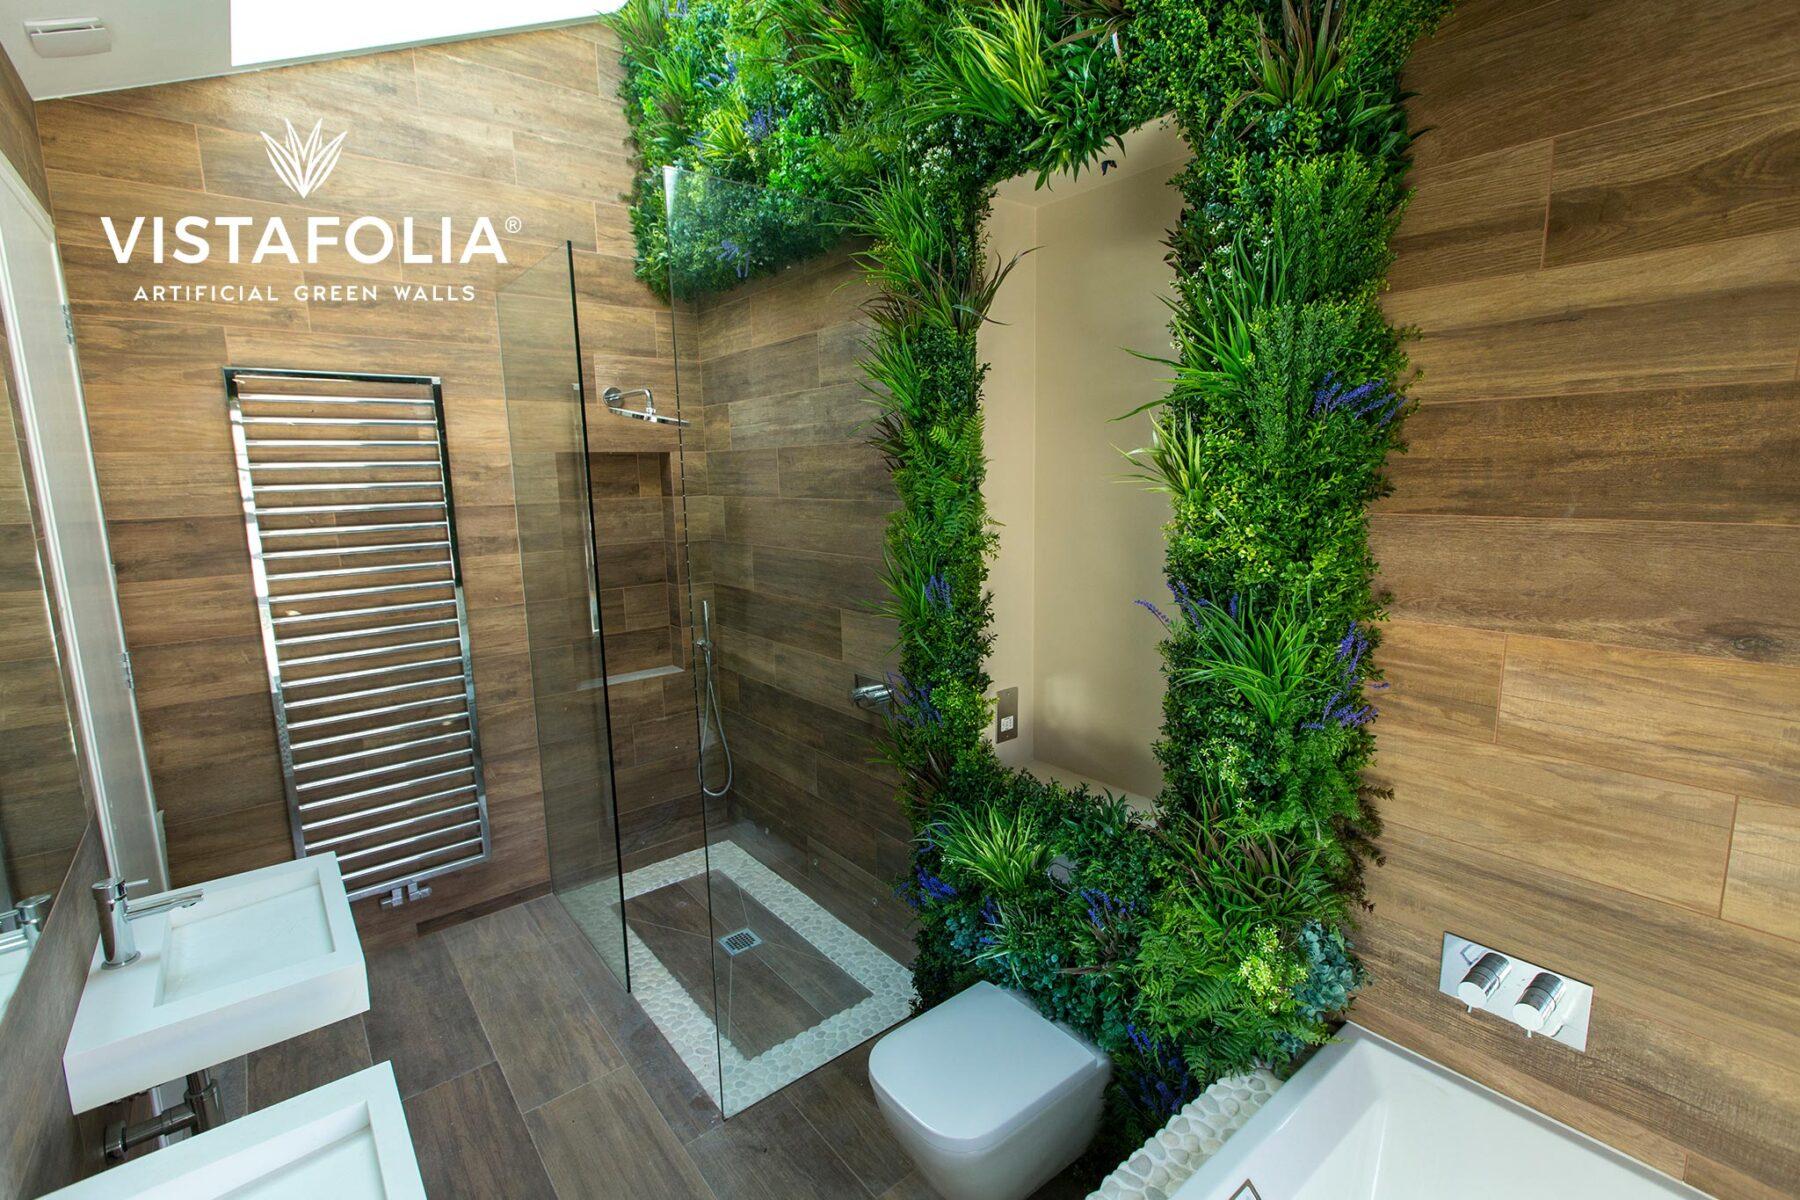 green walls artificial grass install, vistafolia